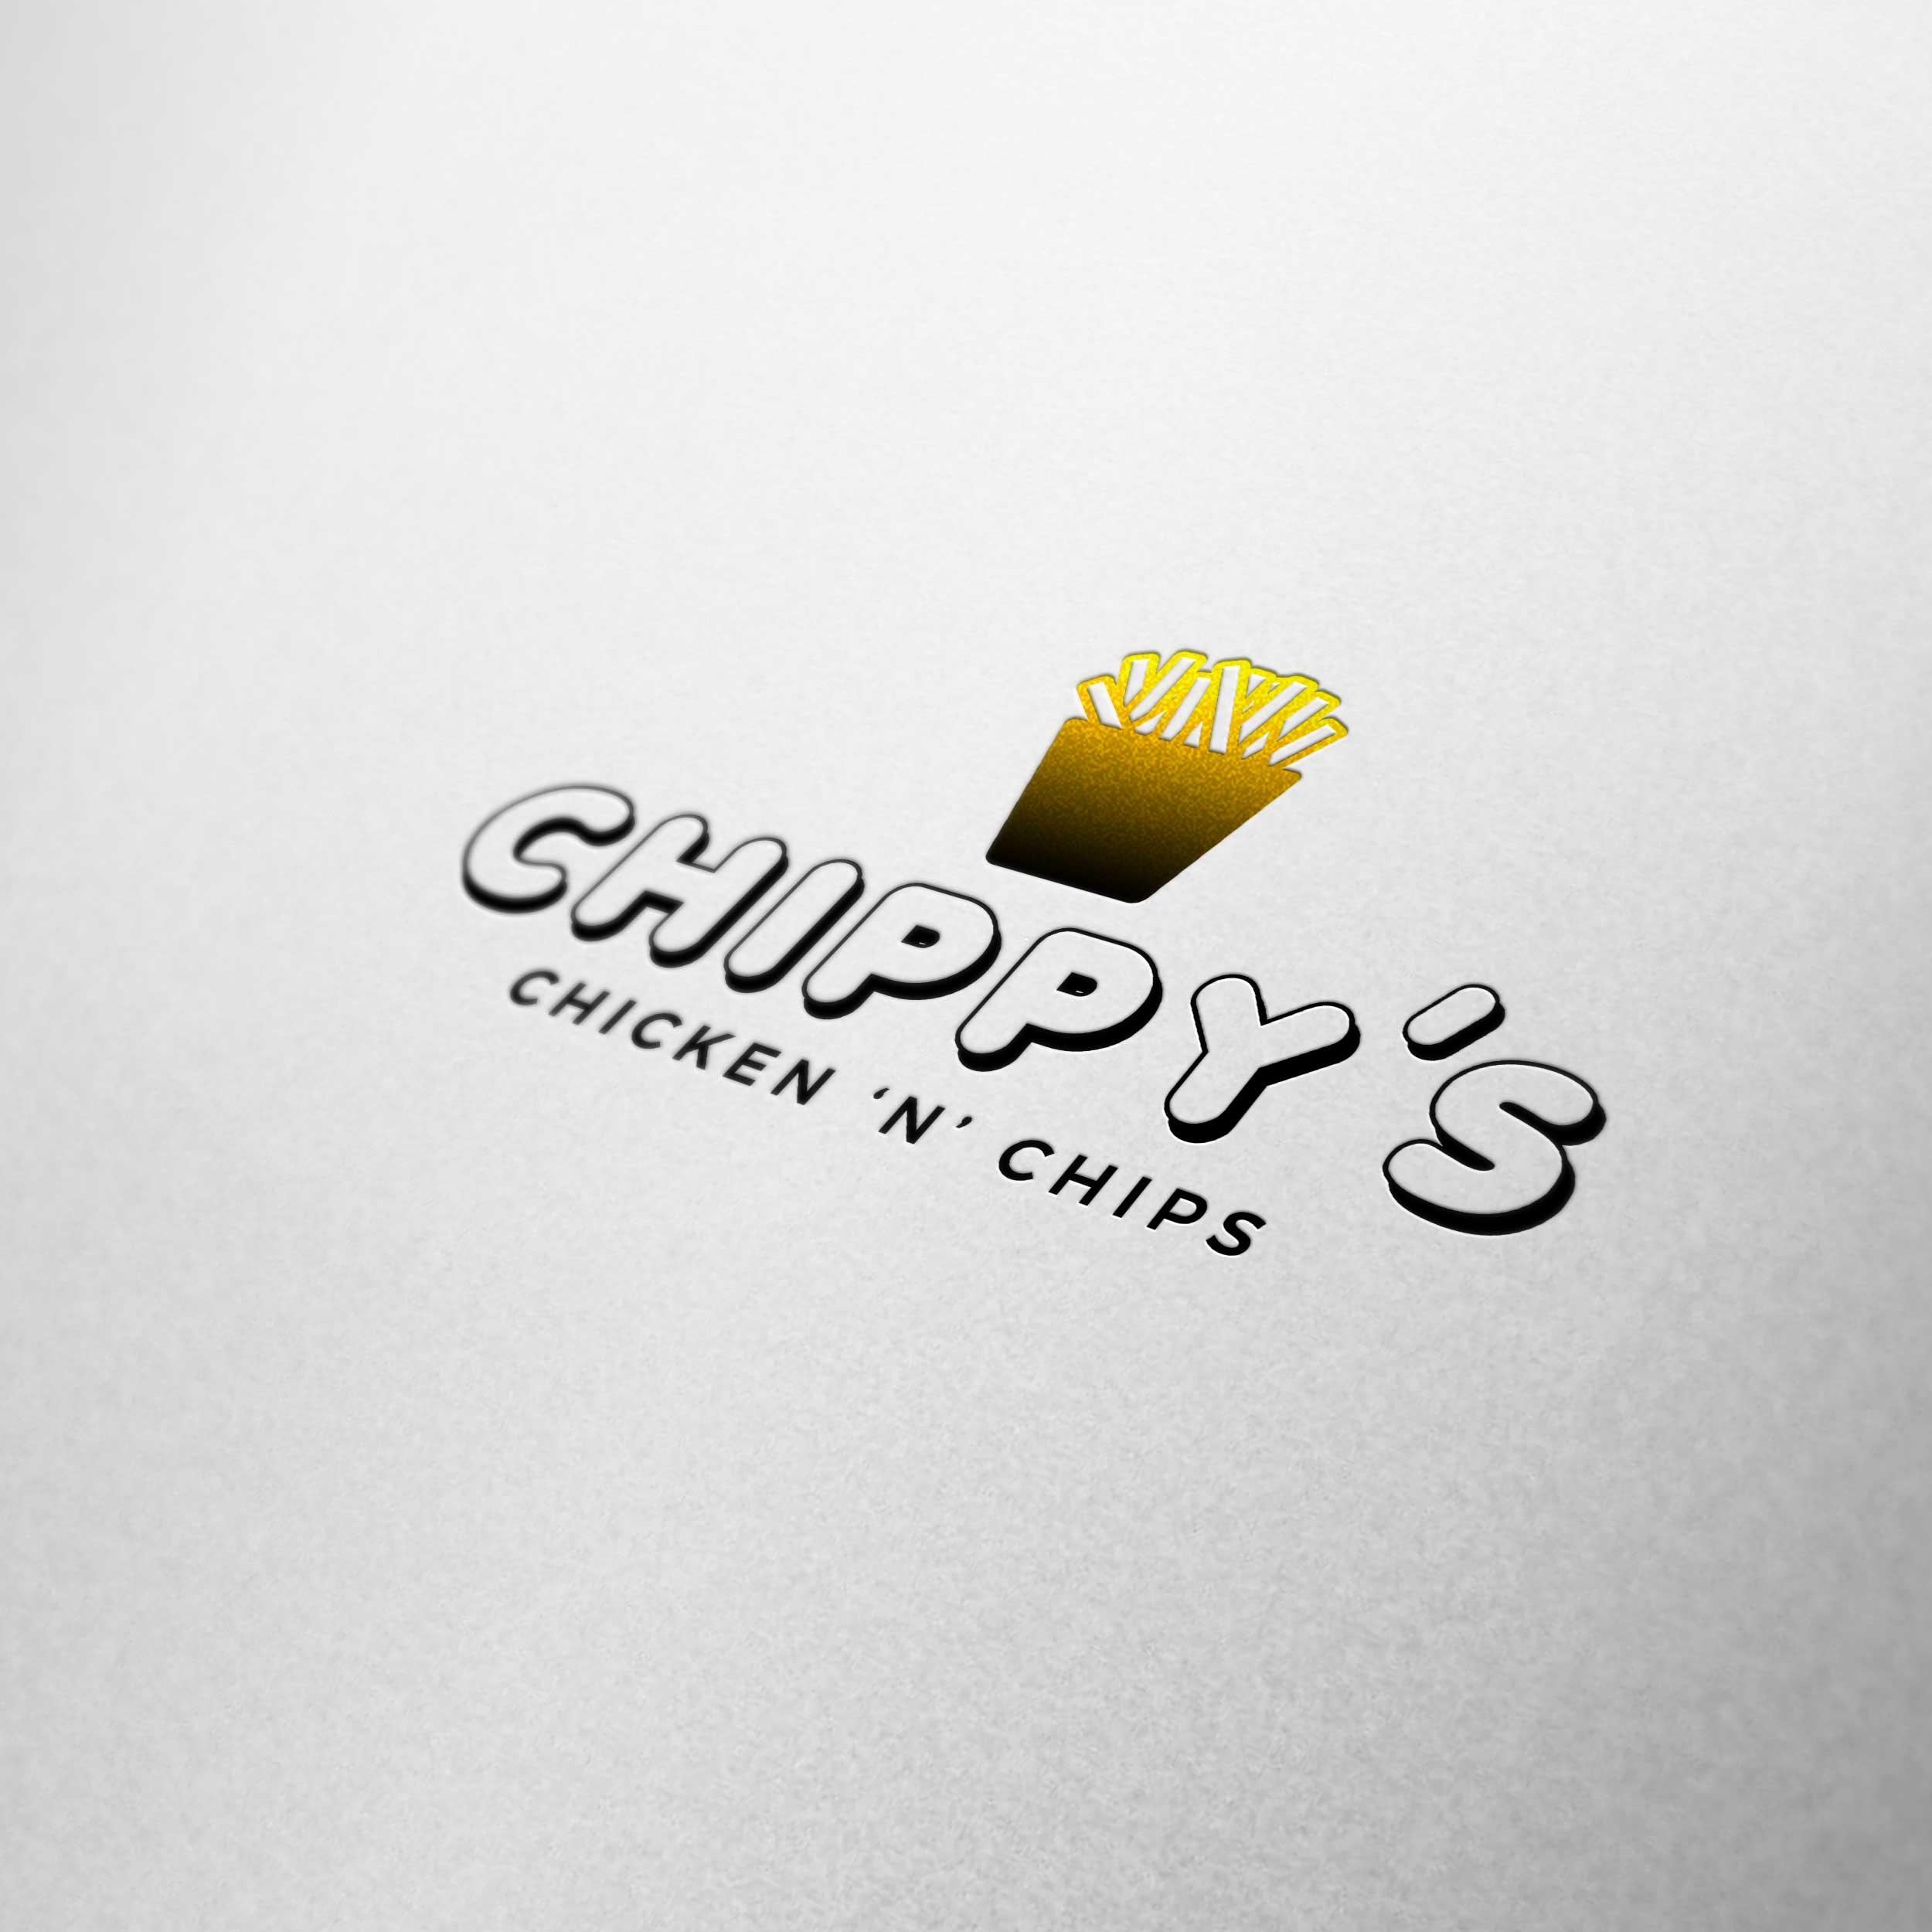 chippys-3-min